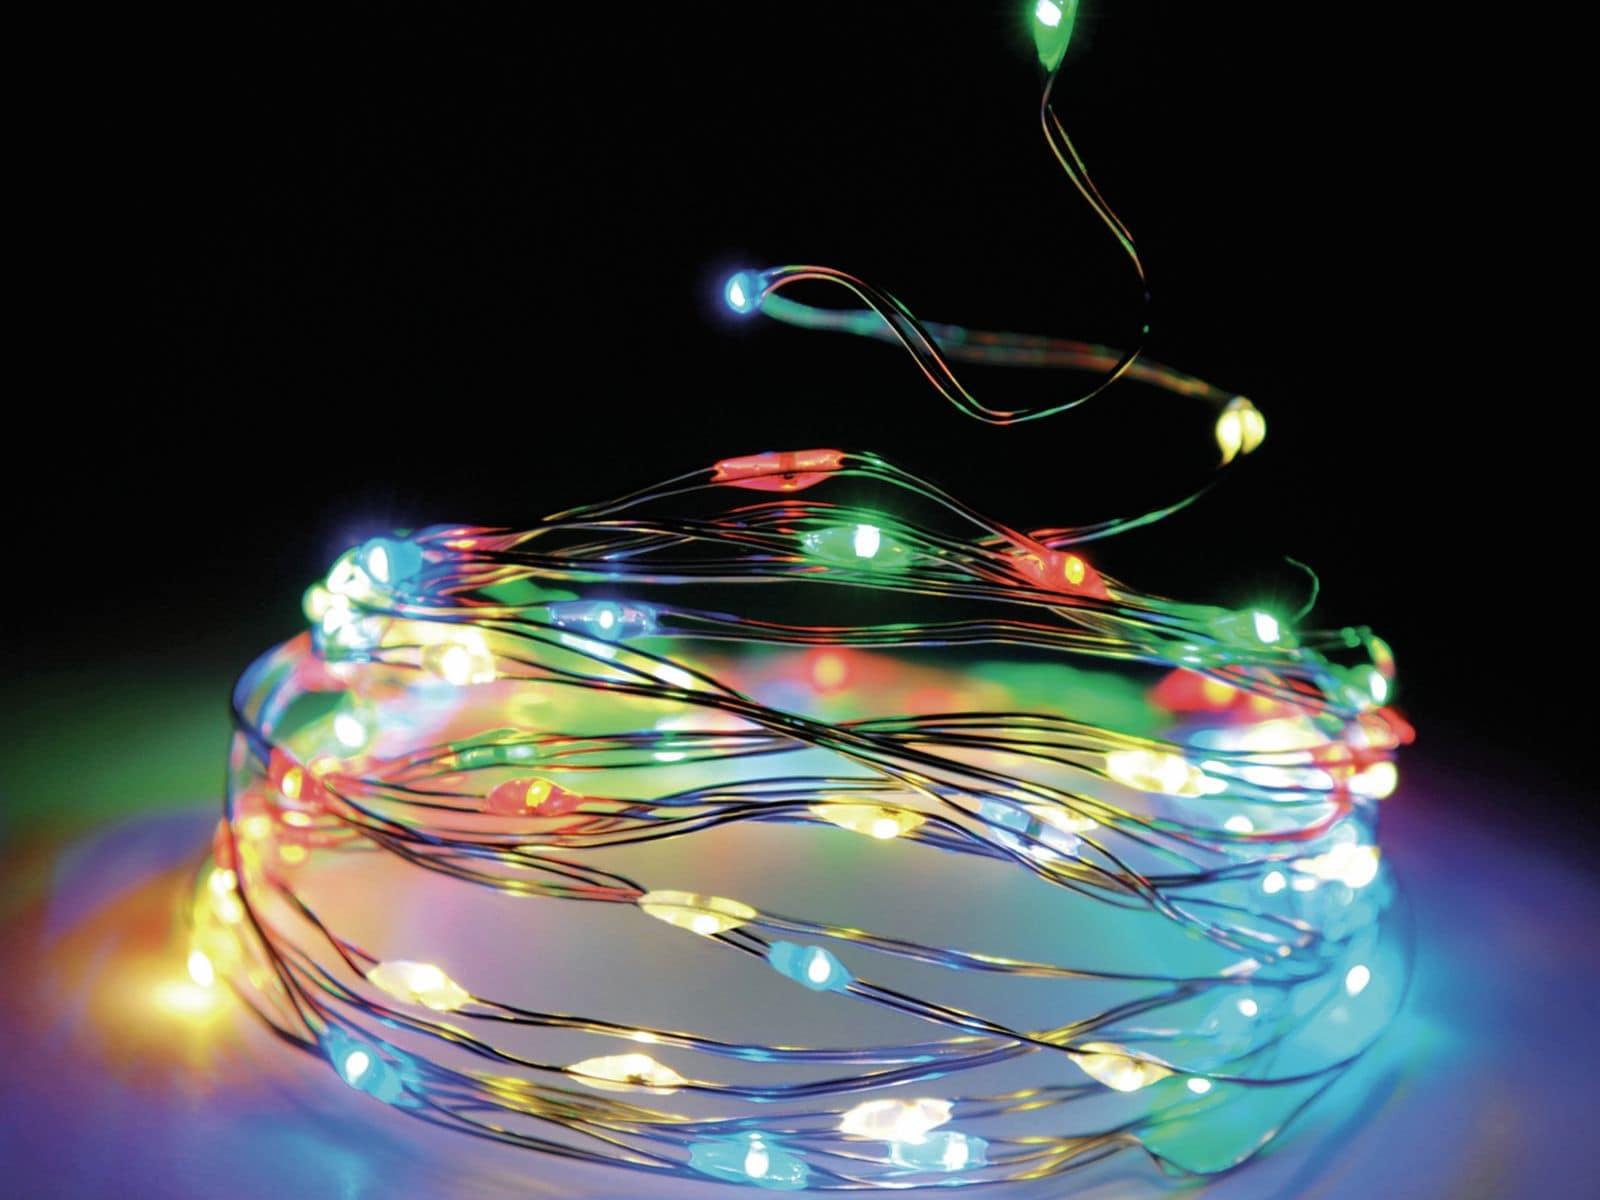 Led Lichterkette Silberdraht 20 Leds Bunt Batteriebetrieb Online Kaufen Pollin De